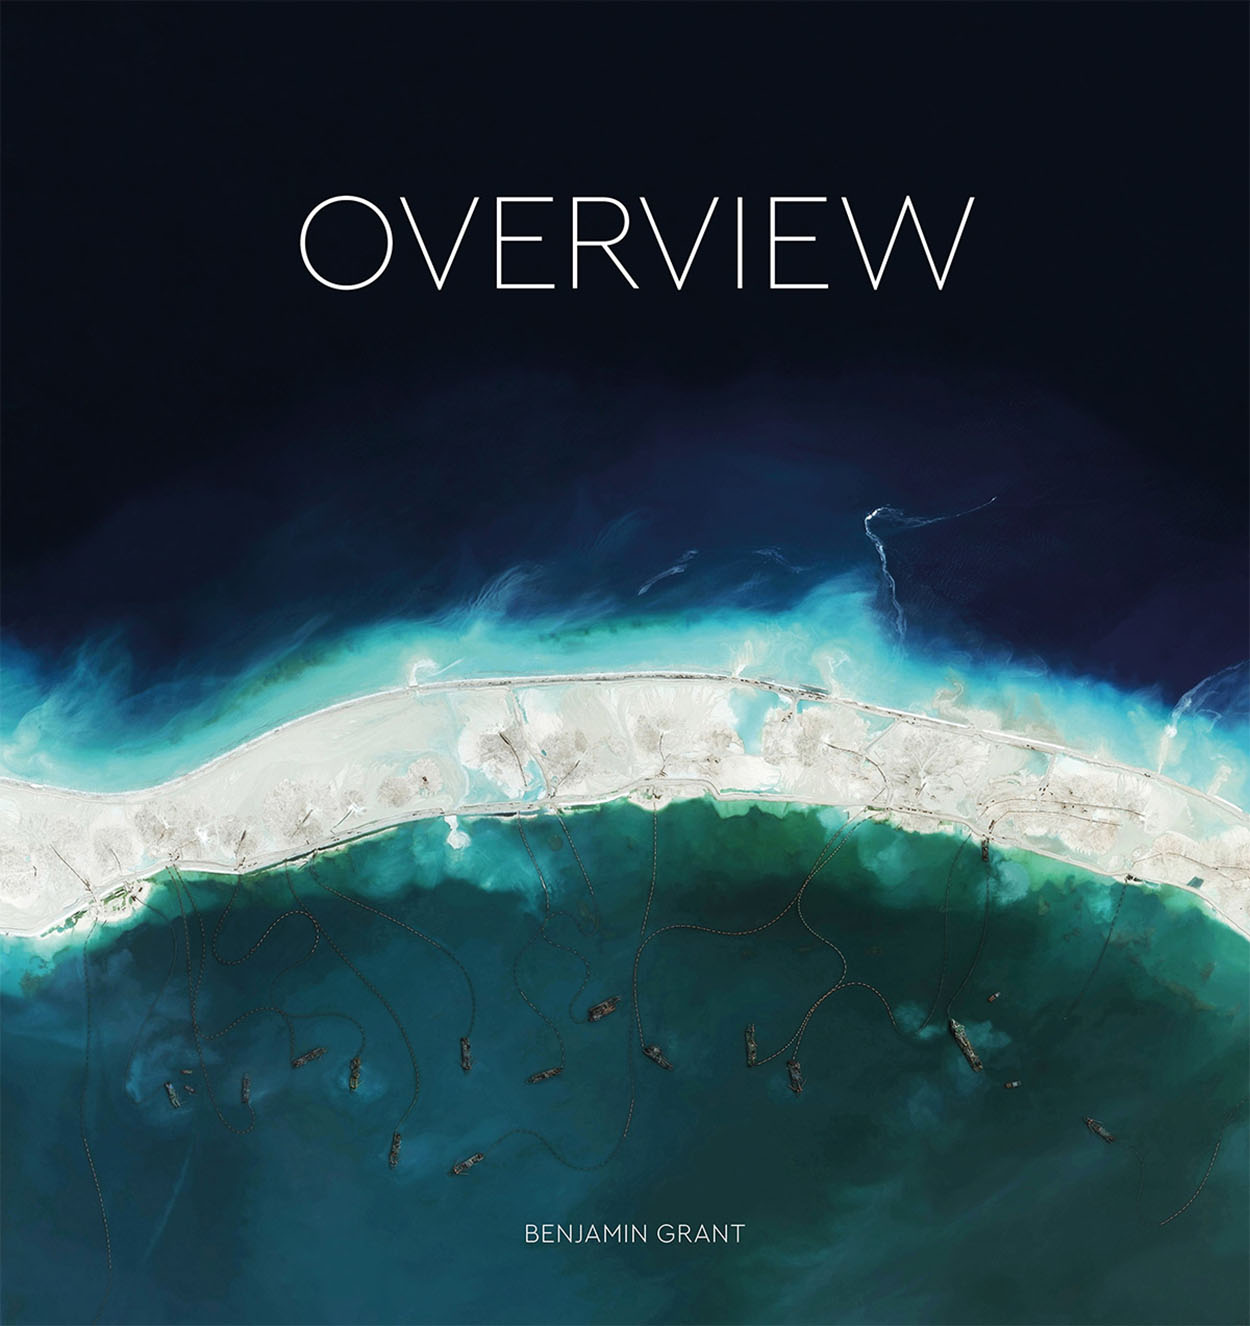 Sanat - Fotoğraf - Kitap - Overview - Doğa - Dünya